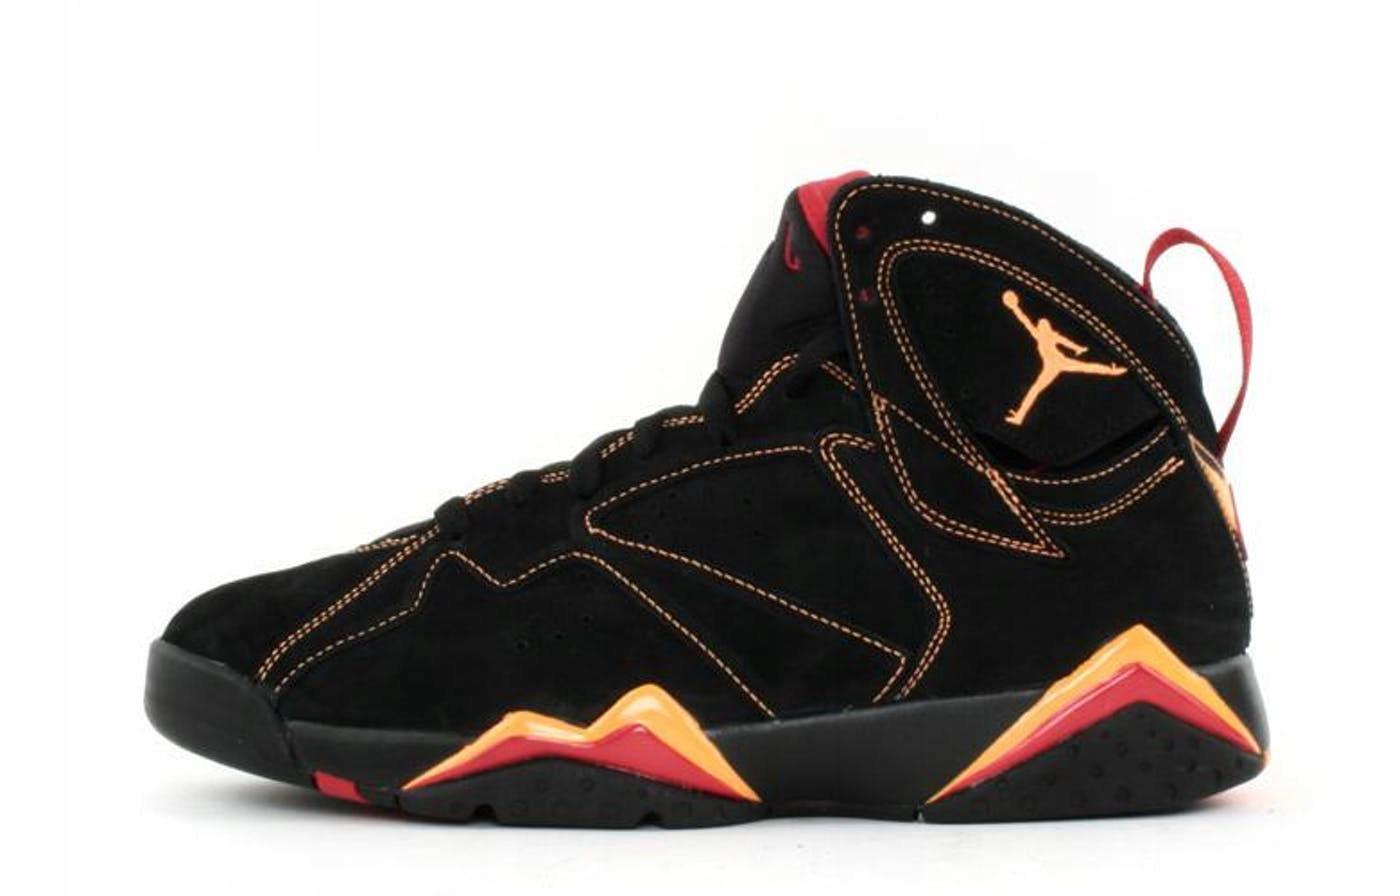 Basketbalové topánky Nike Air Jordan 7 Retro Citrus